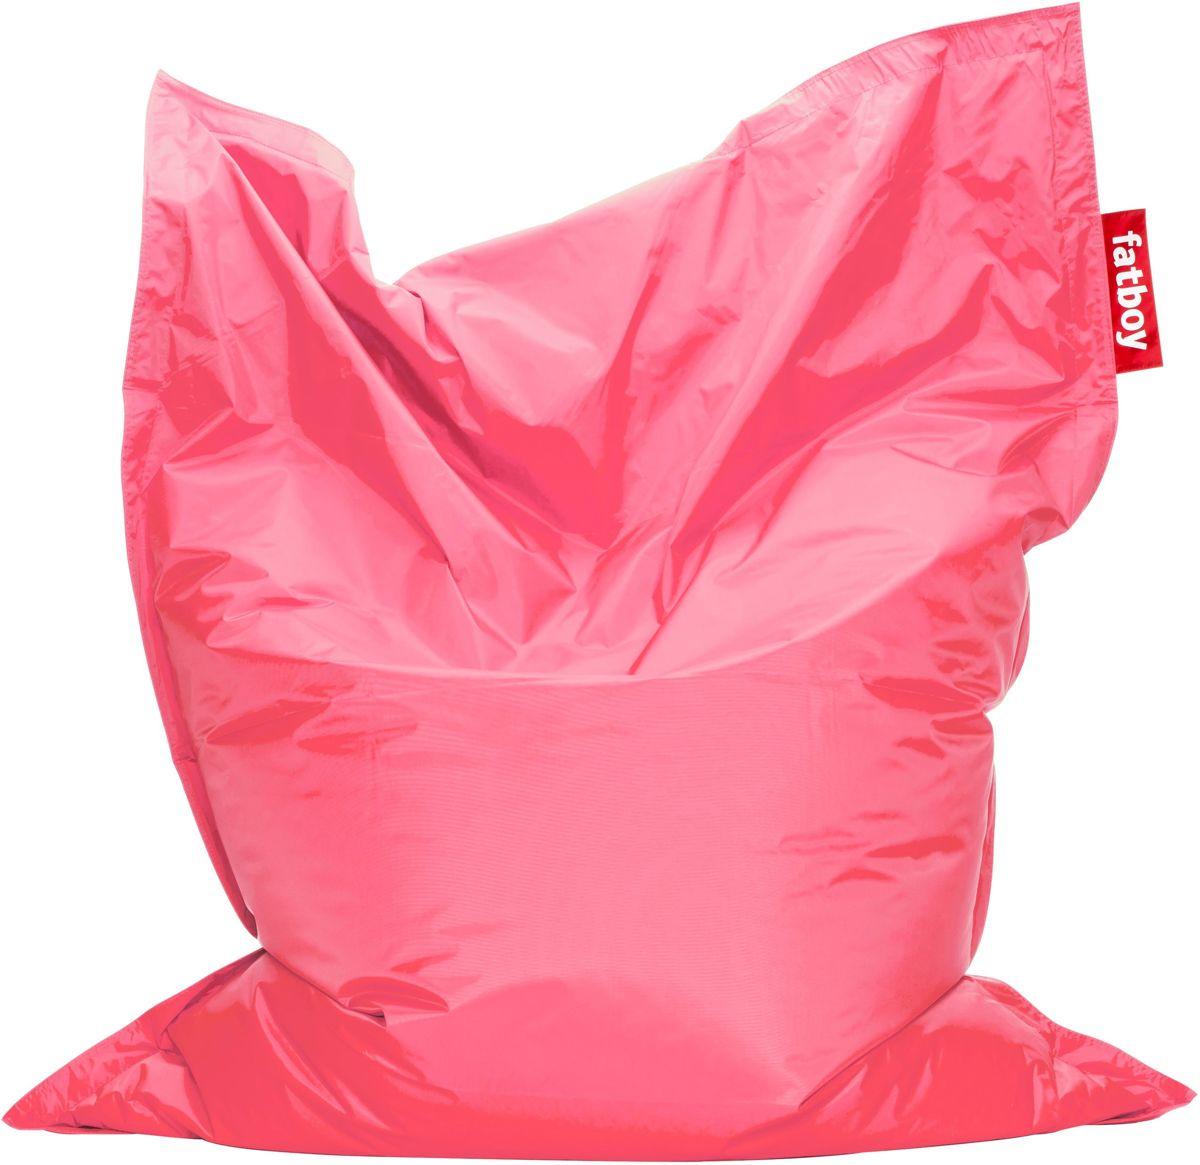 Fatboy Zitzak Camouflage.Bol Com Fatboy Original Zitzak Light Pink